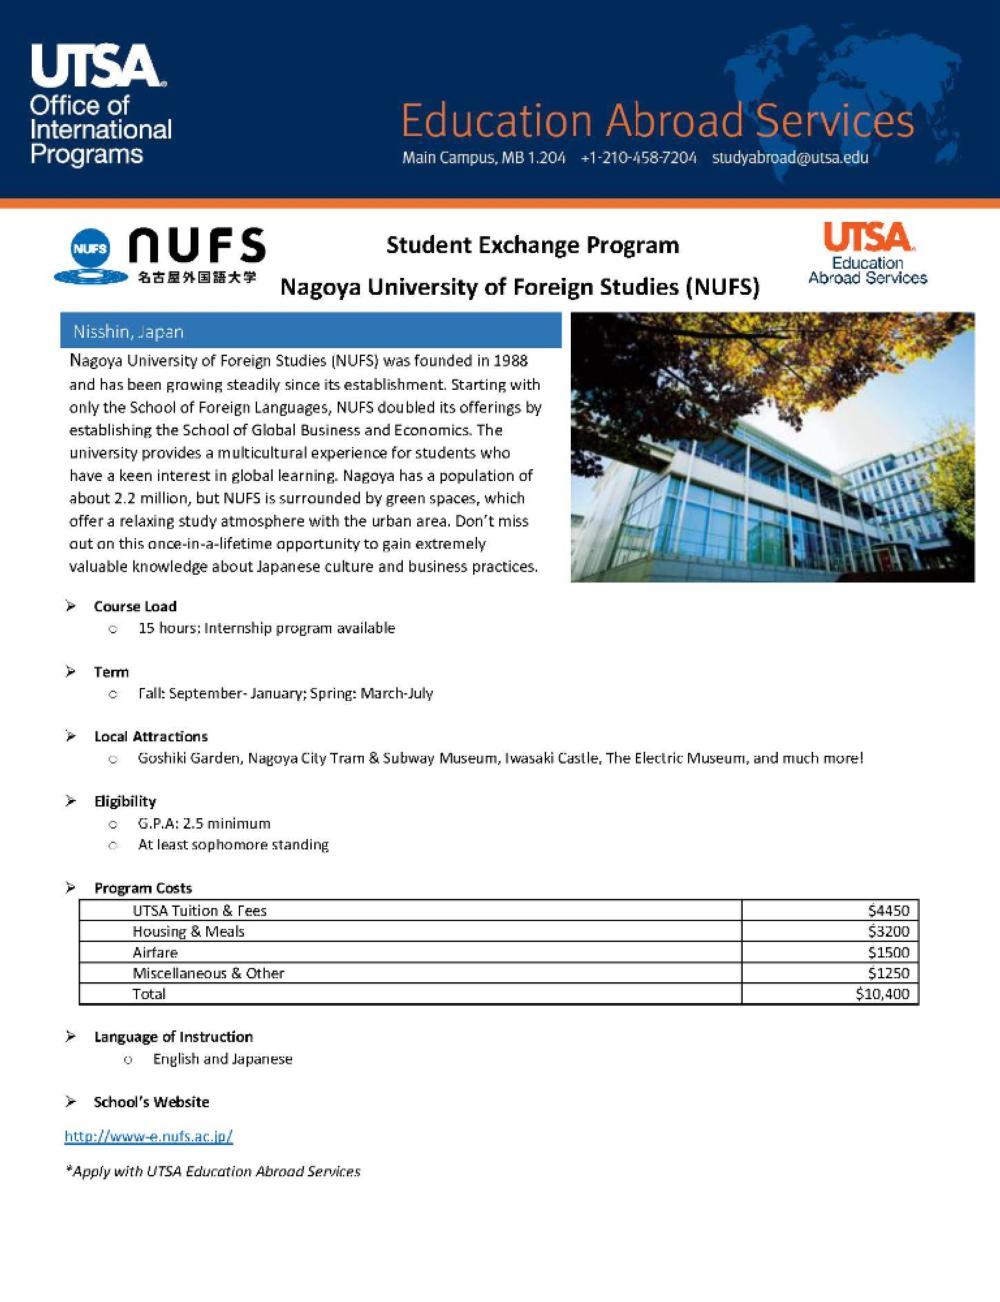 Programs > Brochure > Education Abroad Services